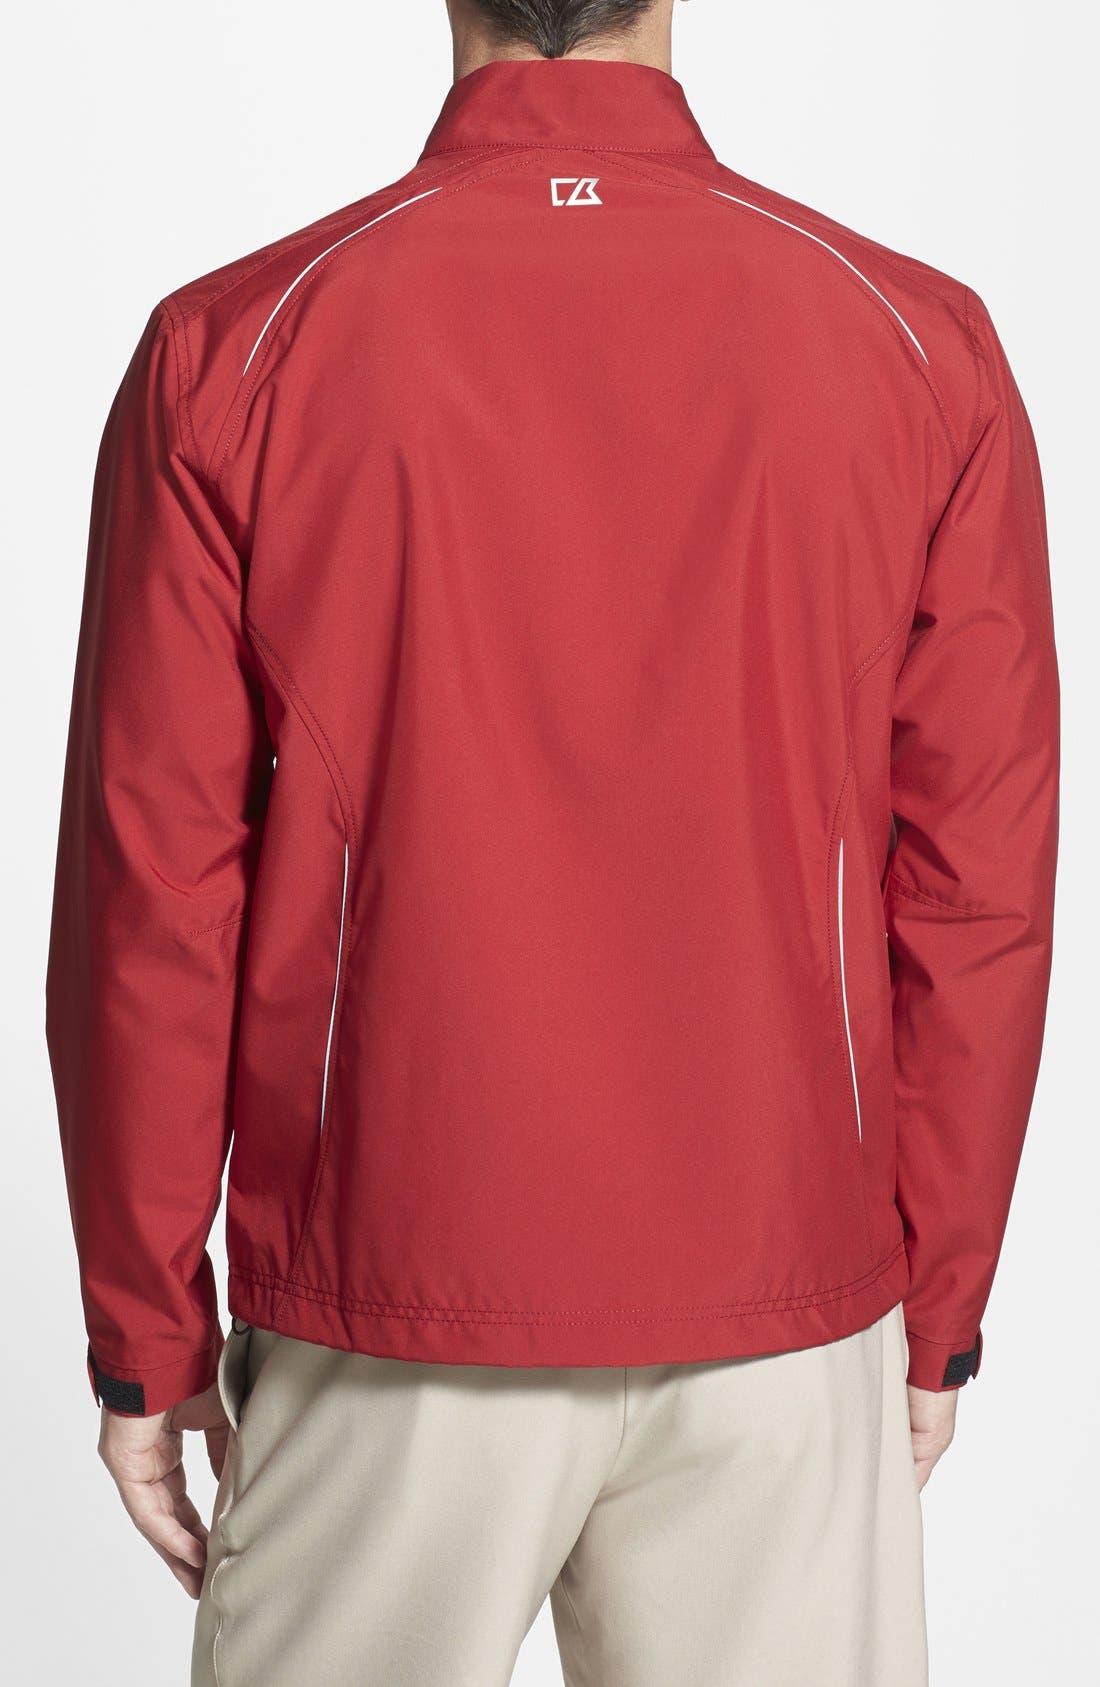 Alternate Image 2  - Cutter & Buck Kansas City Chiefs - Beacon WeatherTec Wind & Water Resistant Jacket